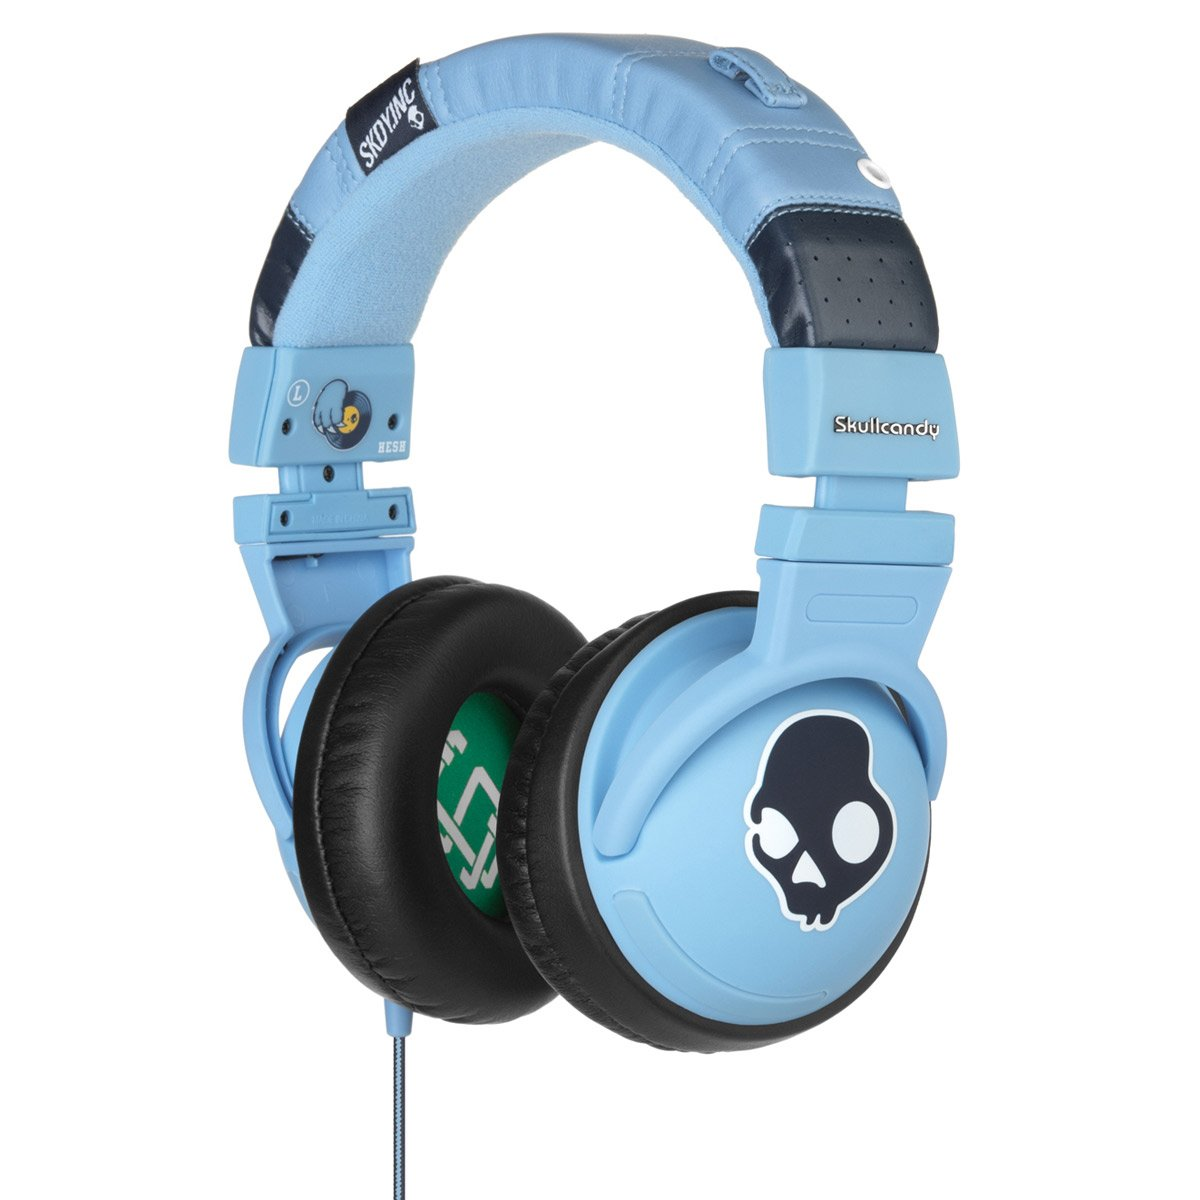 Amazon.com: Skullcandy Hesh Headphones w/Mic - 2011 Light Blue w/Mic ...